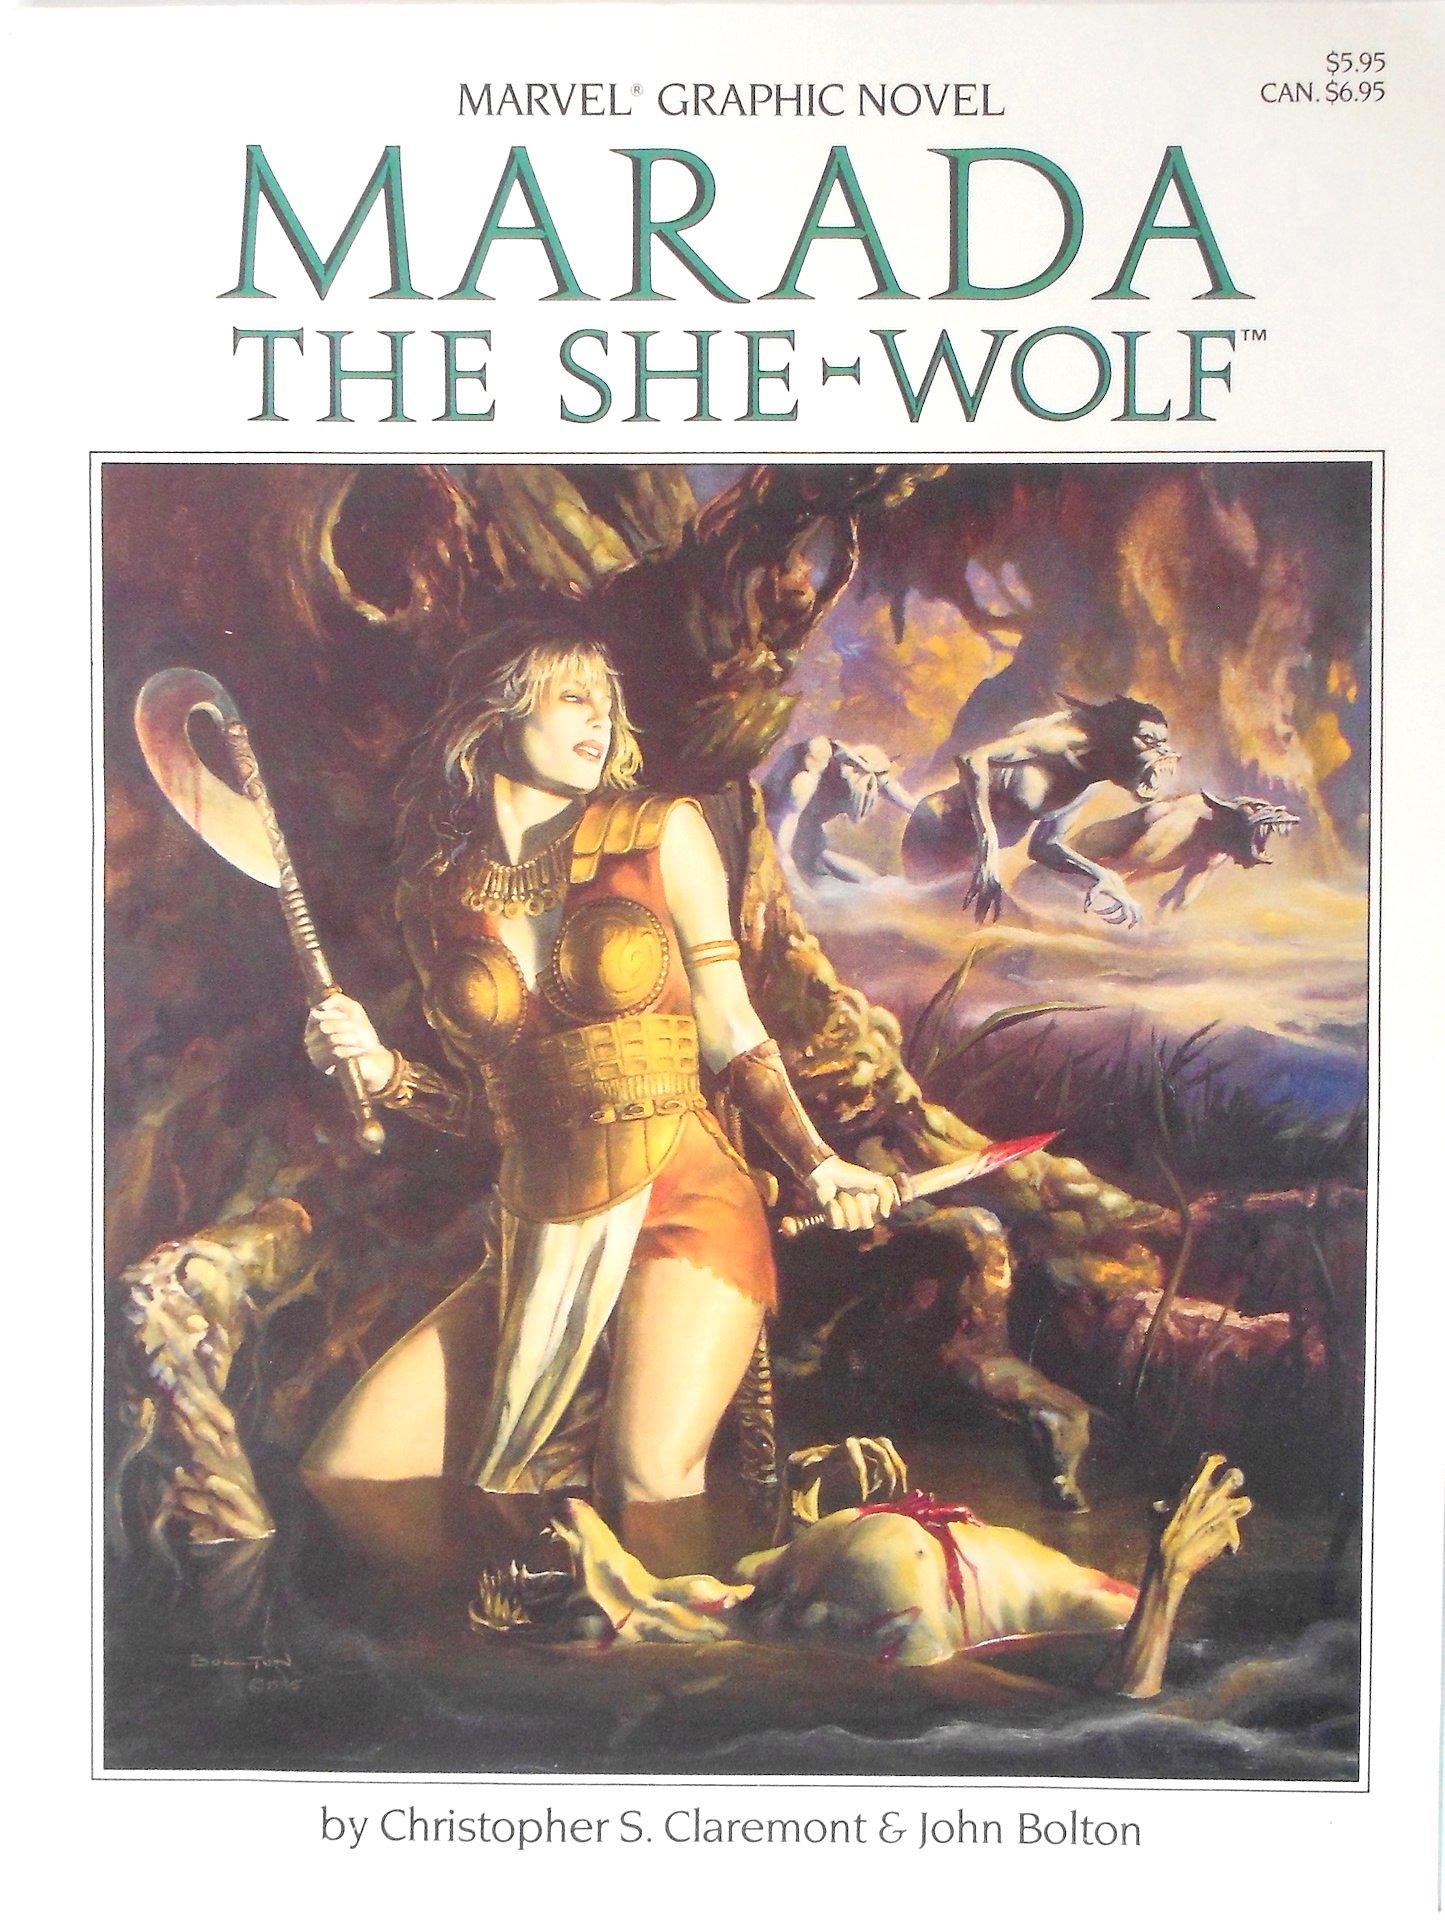 MARADA THE SHE WOLF EPUB DOWNLOAD